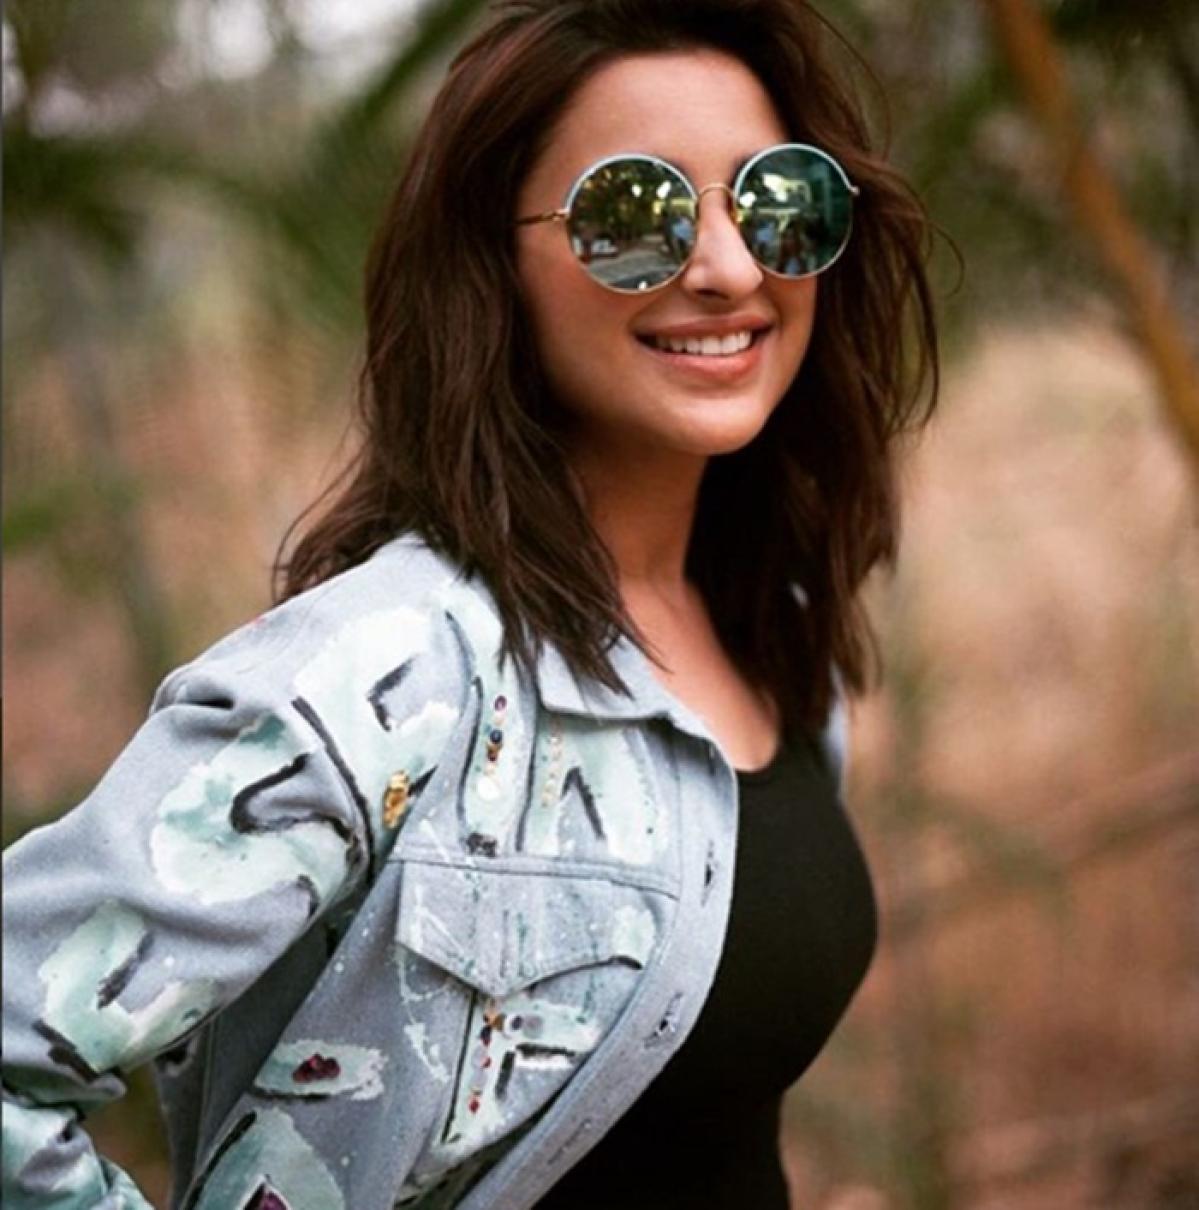 I am signing amazing films, says Parineeti Chopra